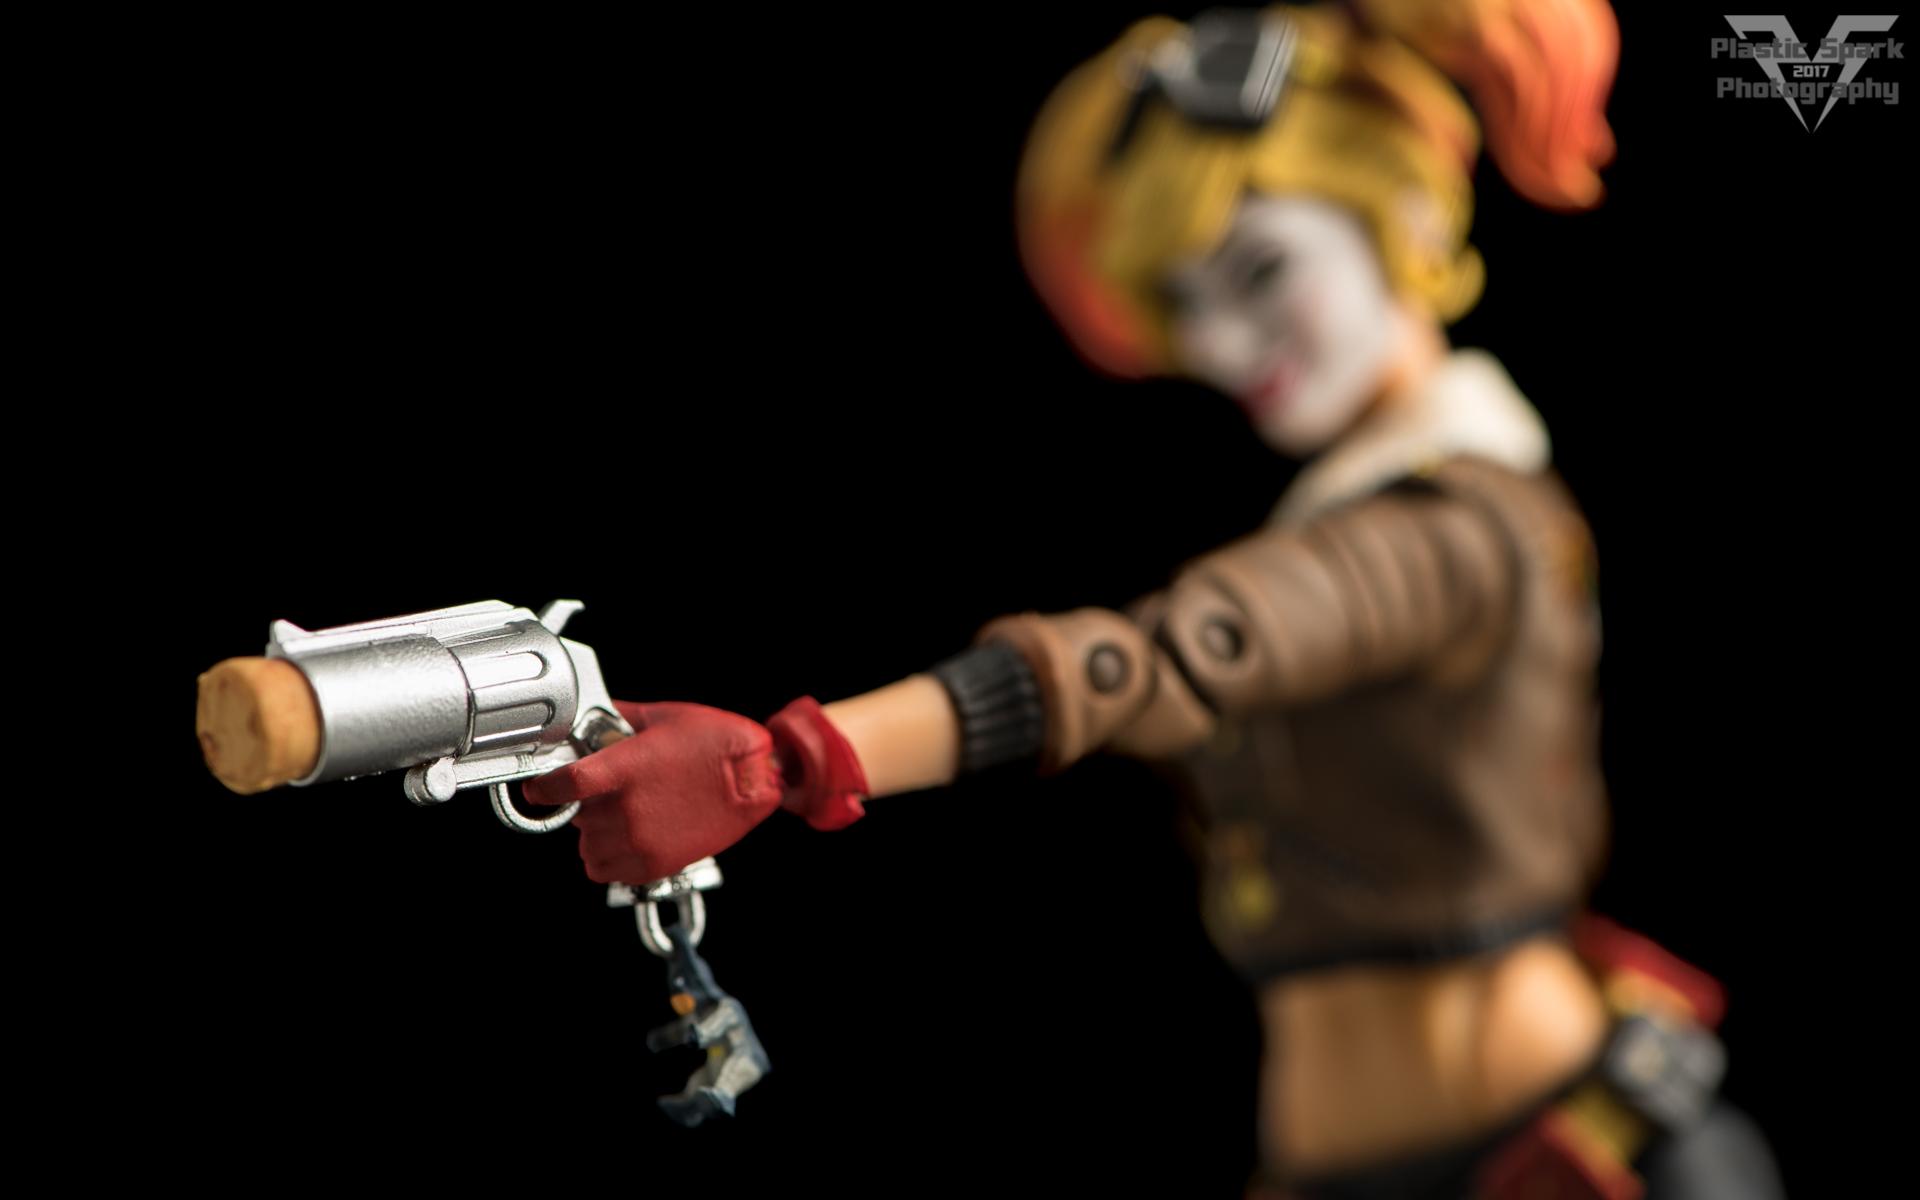 Bombshell-Harley-Quinn-(7-of-12).png